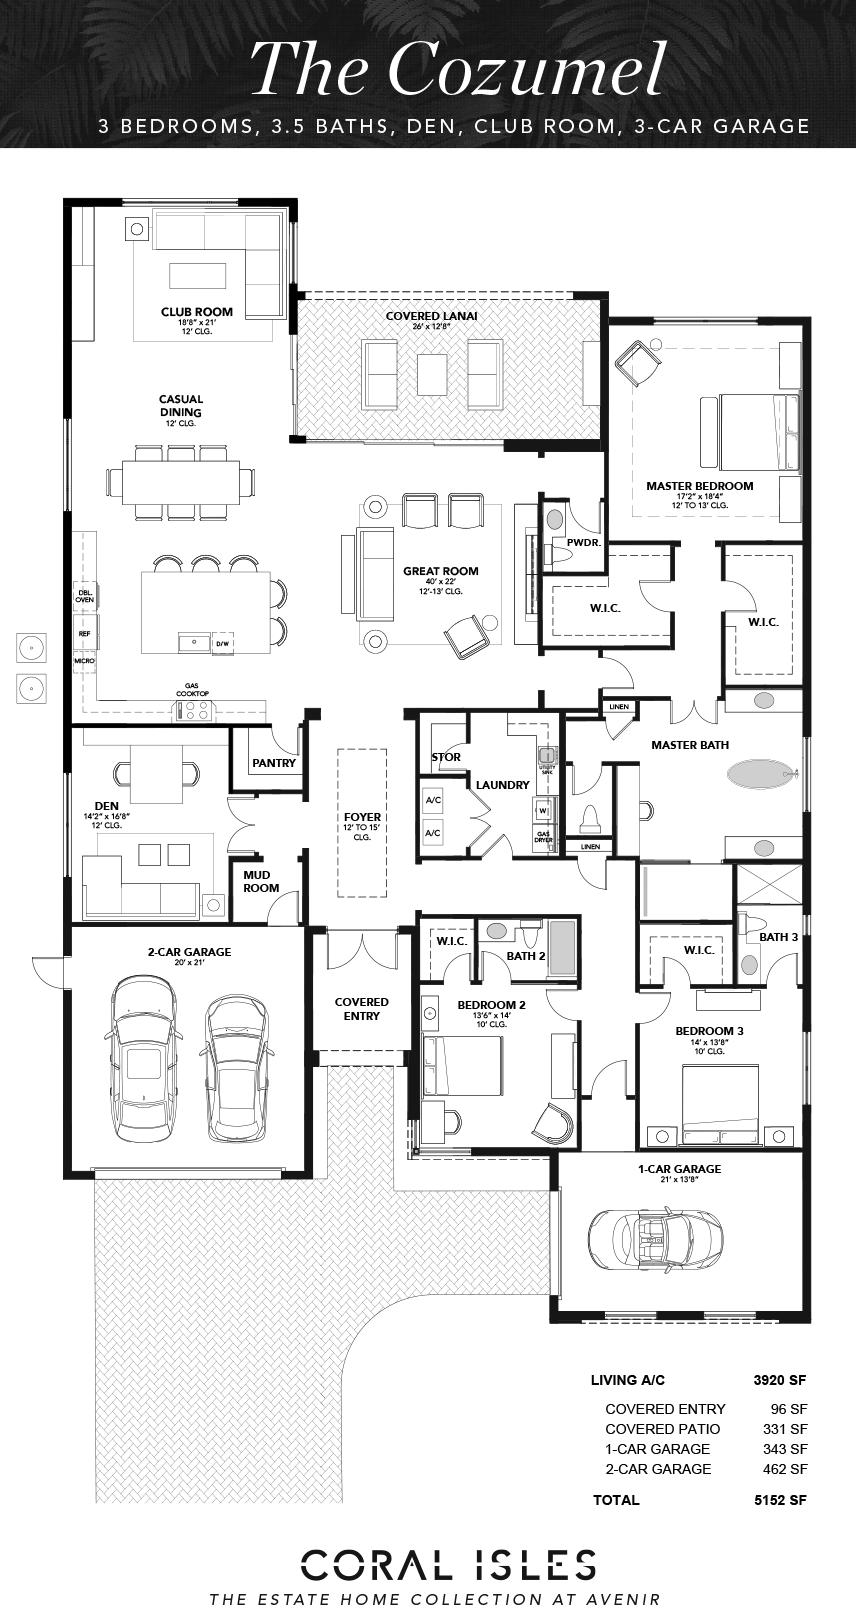 Cozumel Floorplan